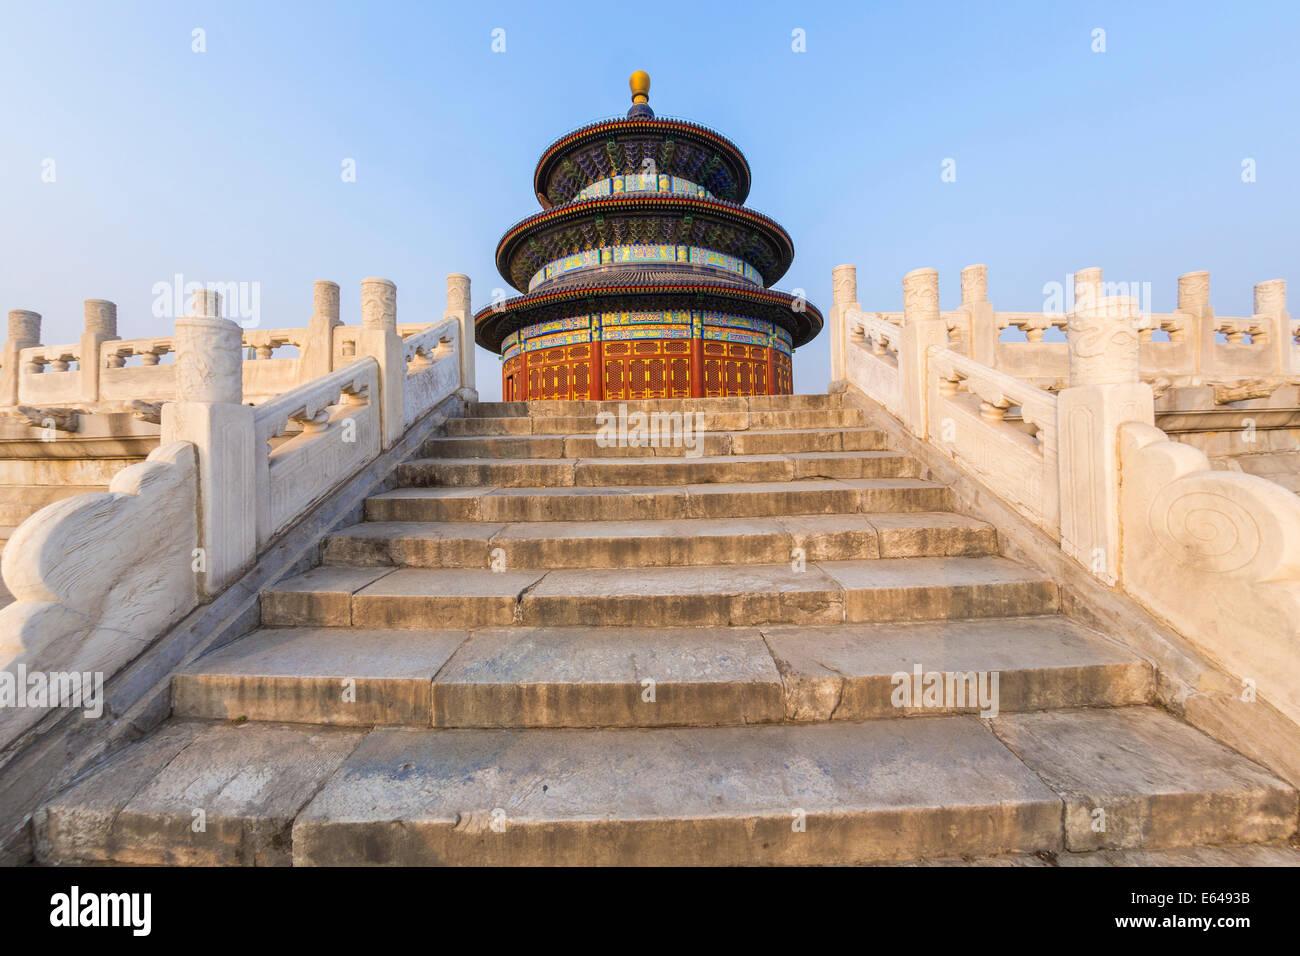 Tempel des Himmels & Hall des Gebets für die Ernte, Peking, China Stockbild